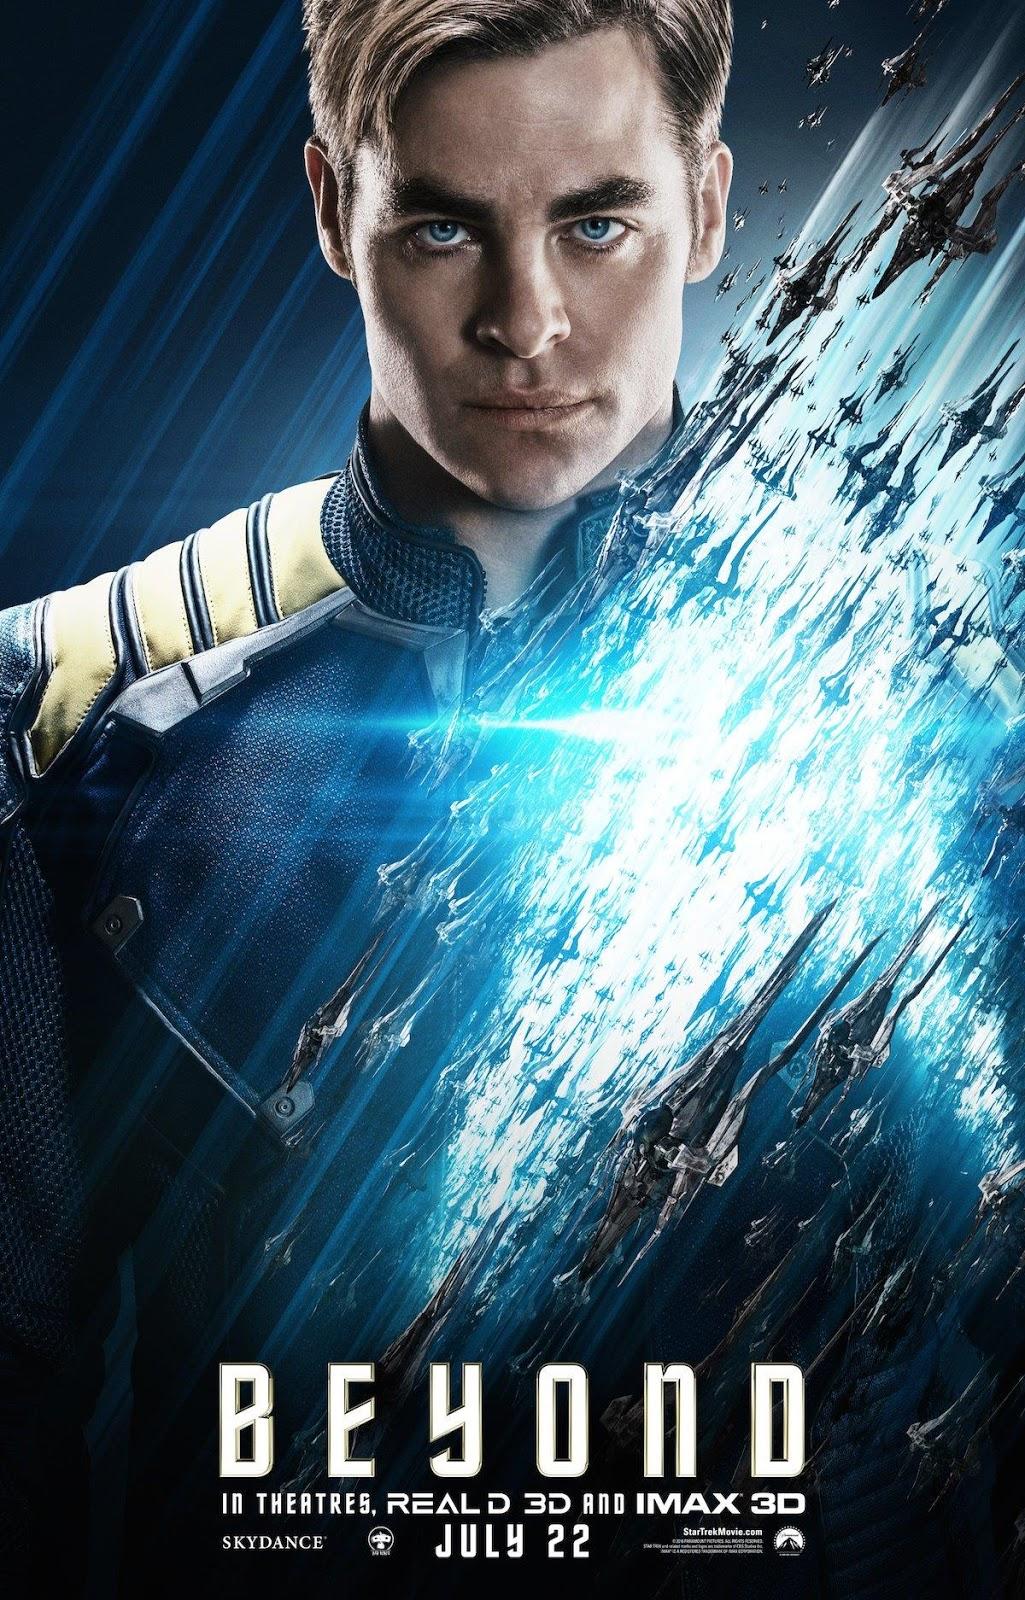 Download Subtitle indo english Star Trek Beyond (2016) HDCAM